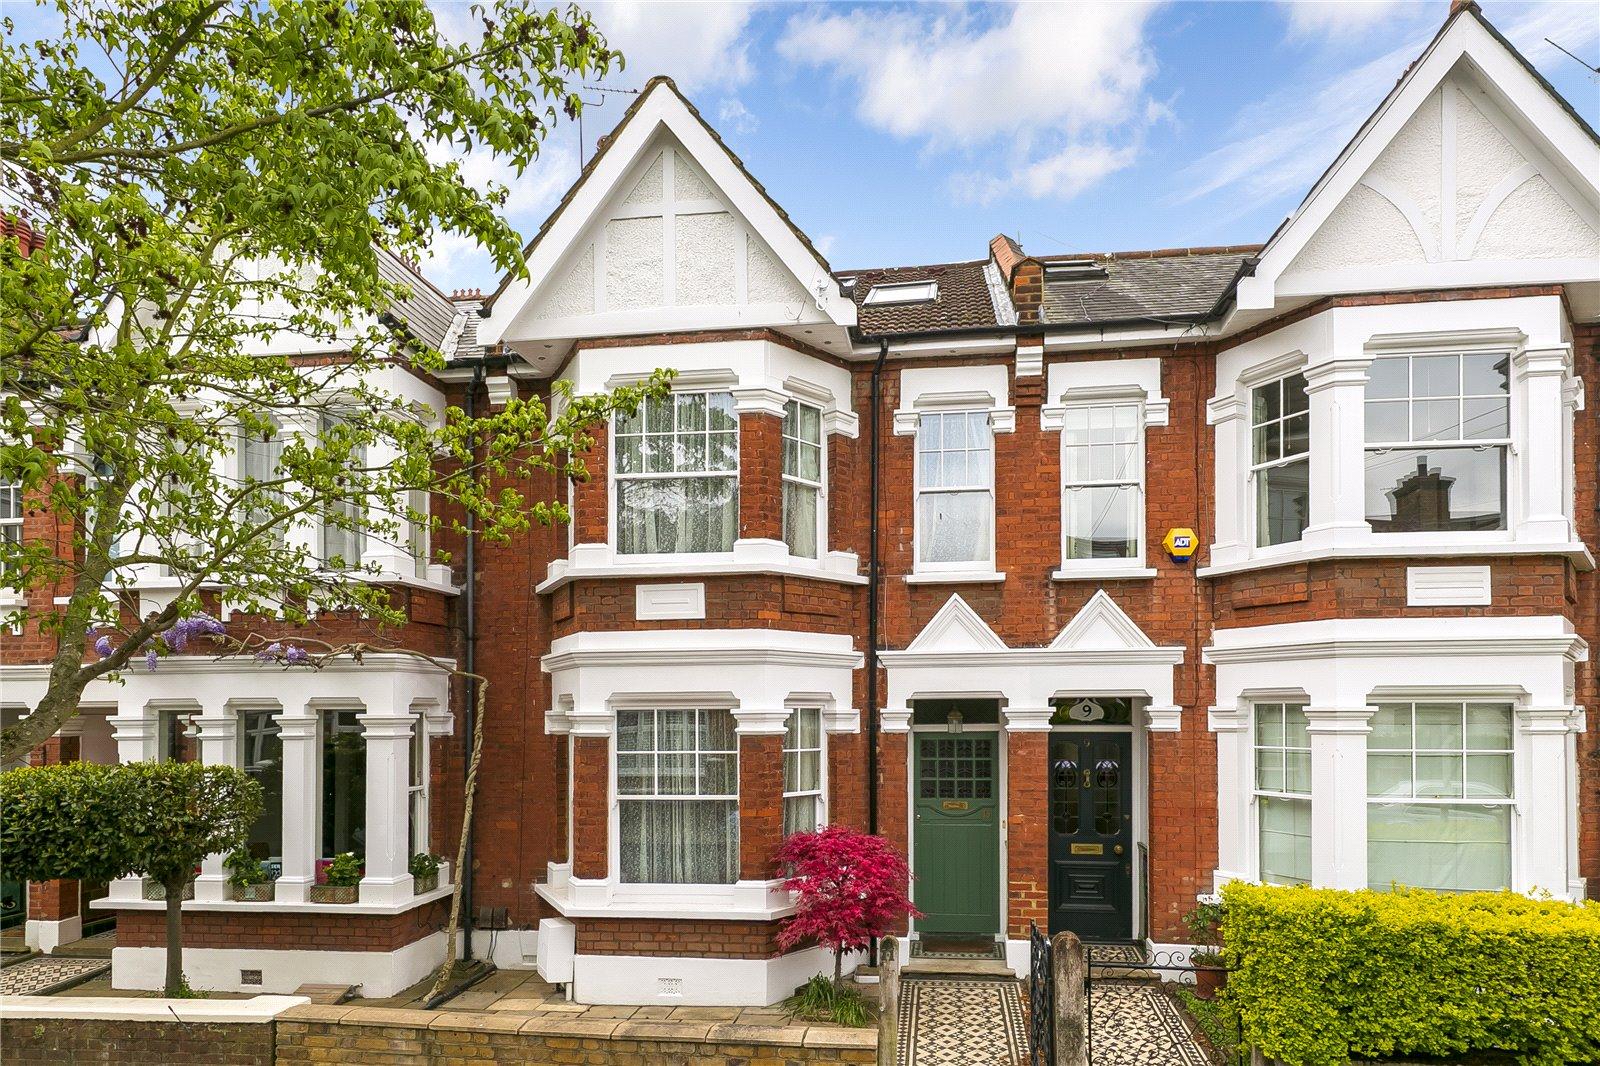 Defoe Avenue, Kew, TW9 4DL - Antony Roberts